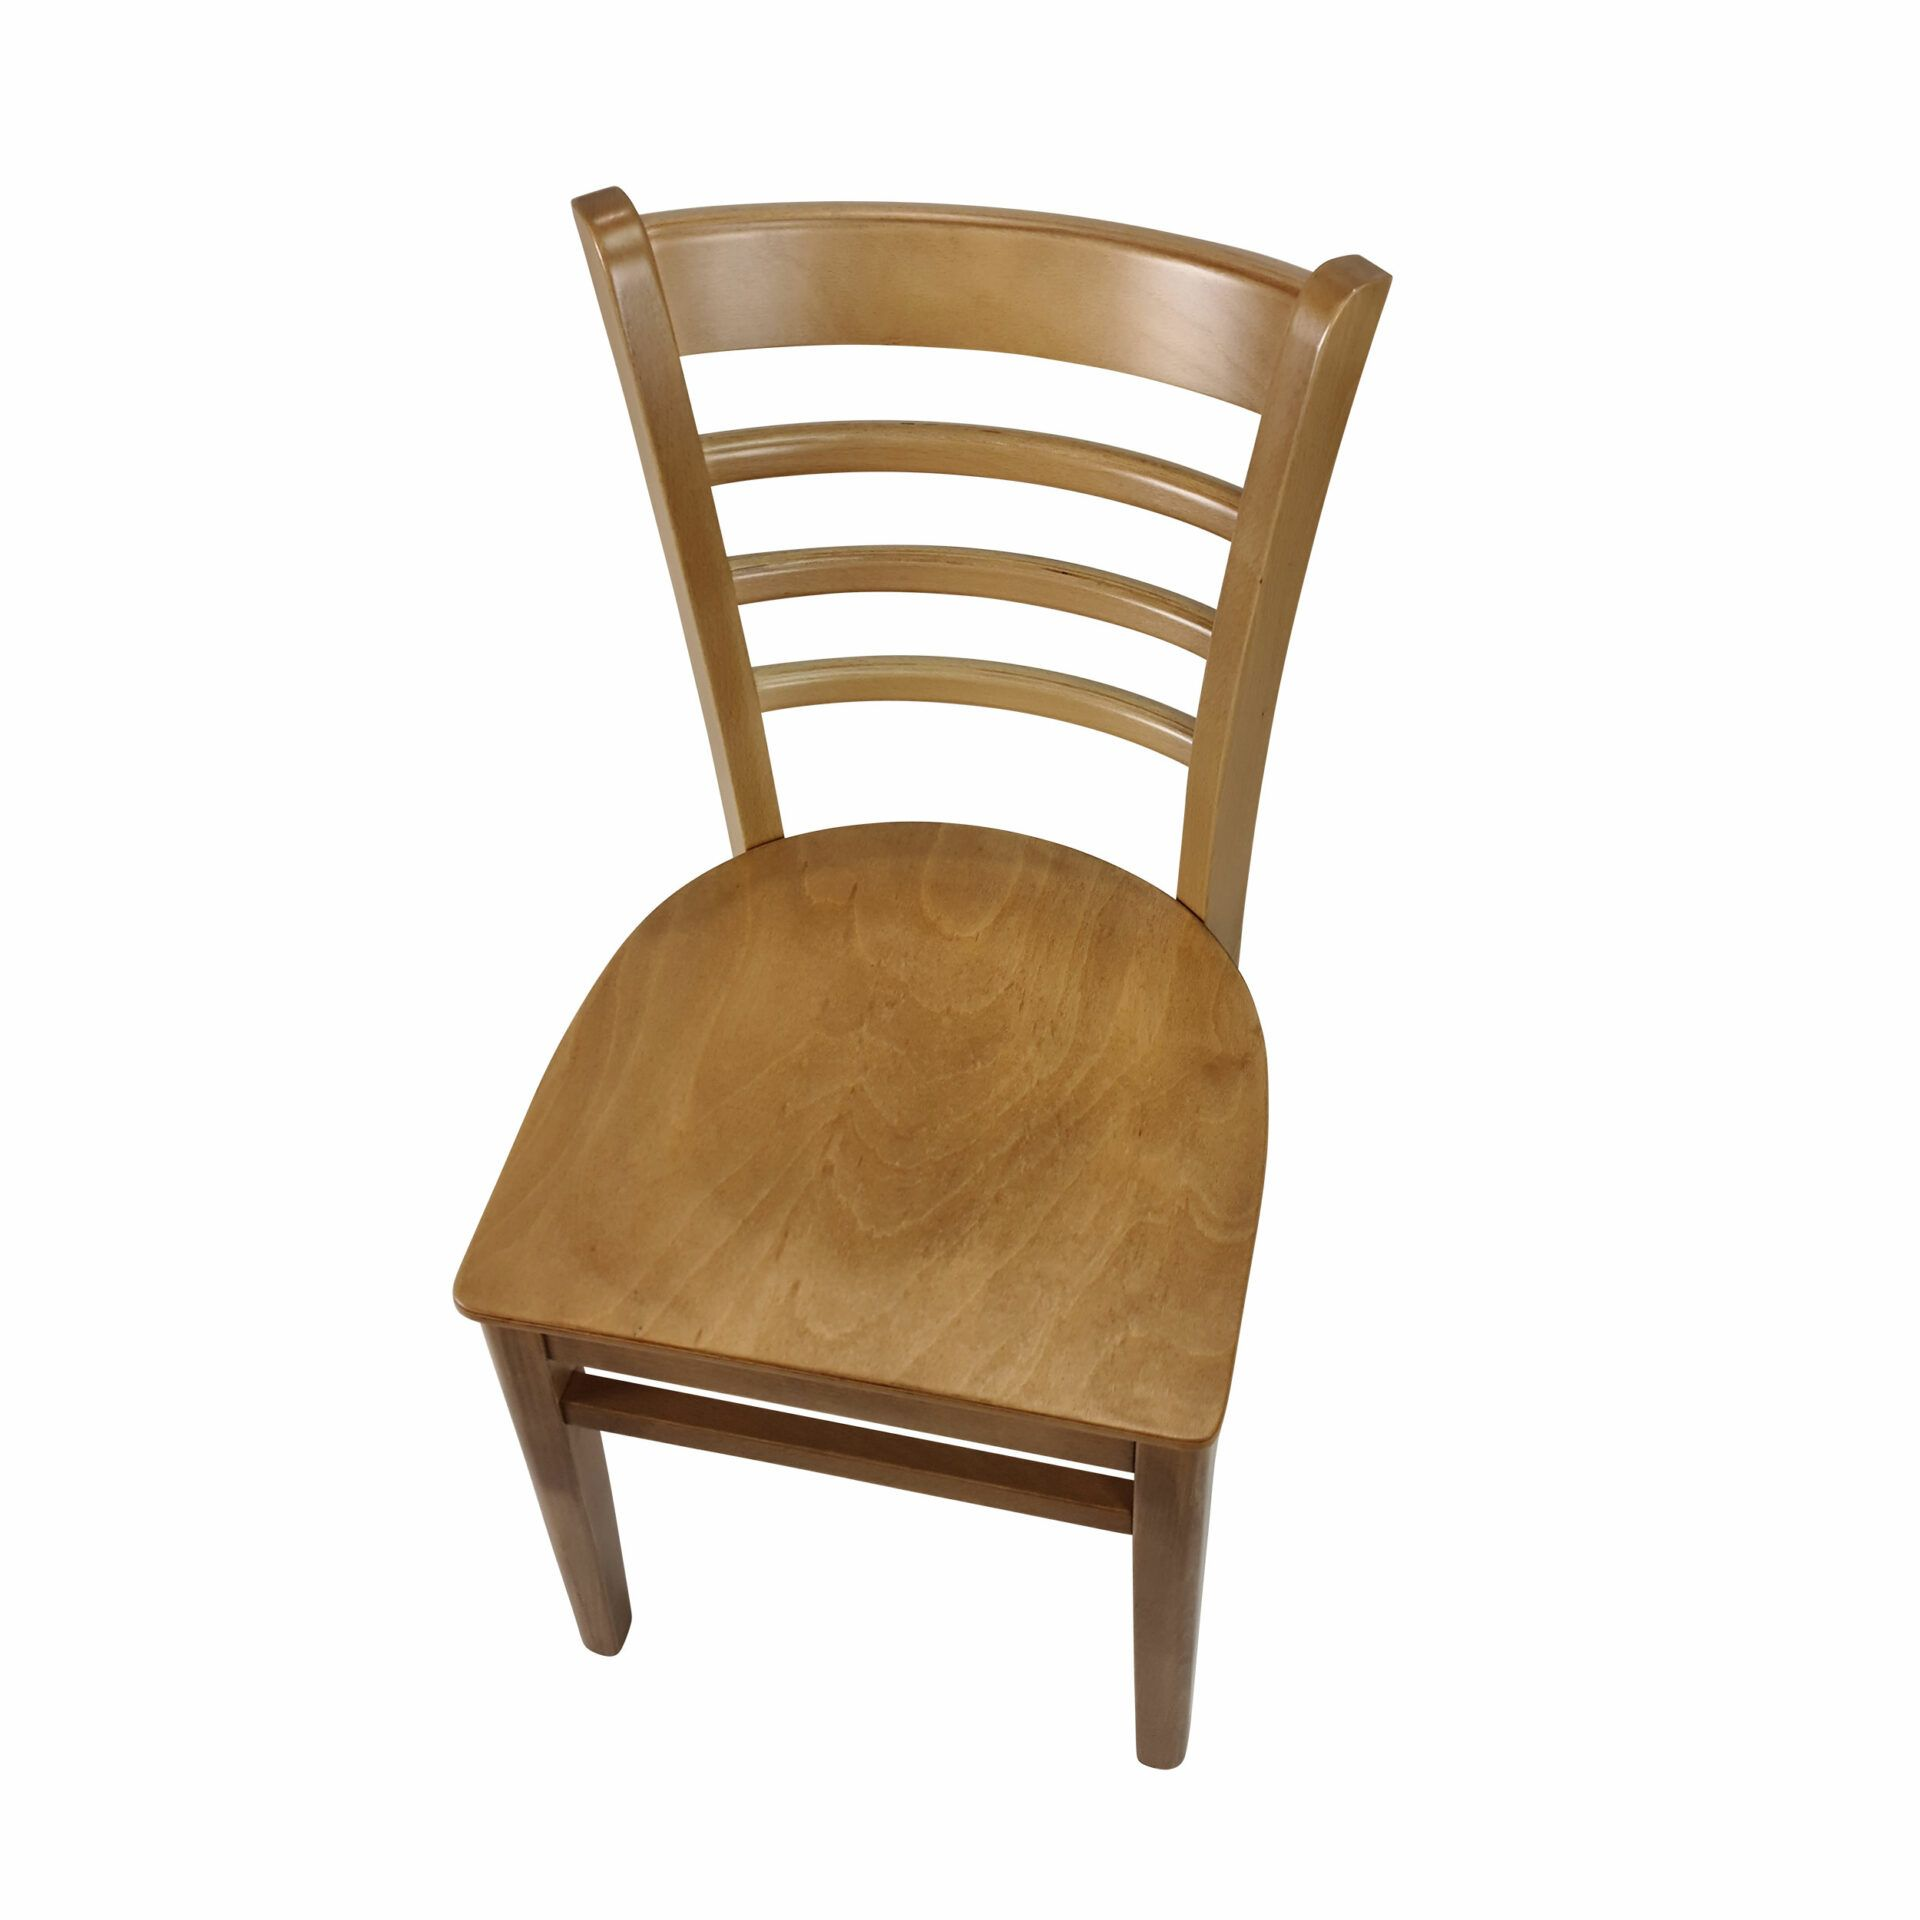 florence chair natural.top angle